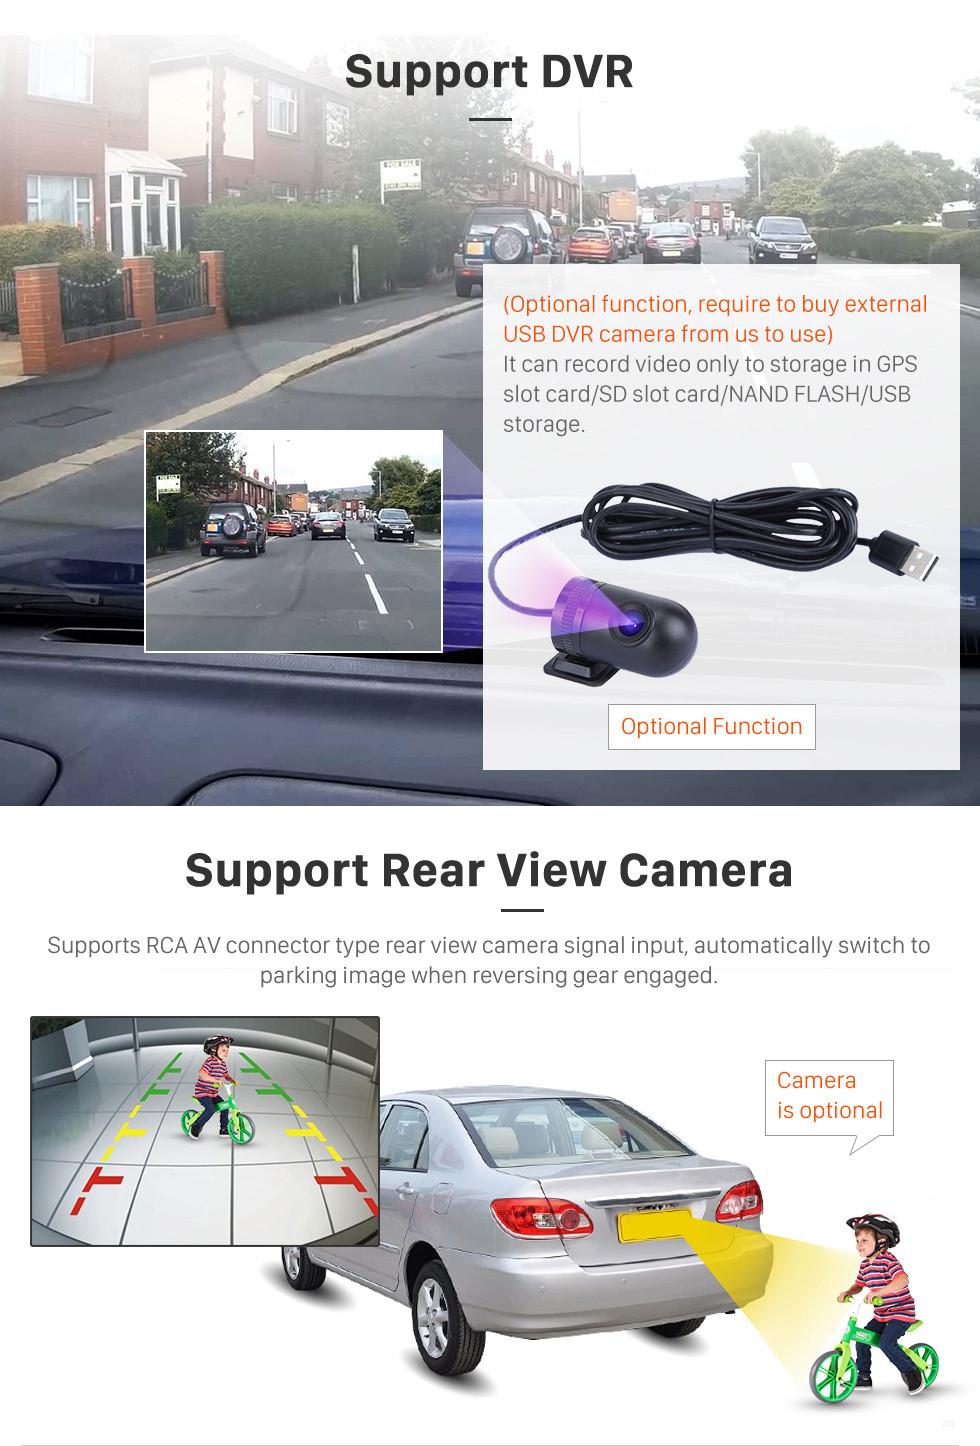 Seicane 9 inch For 2019-2020 Mitsubishi Triton Radio Android 10.0 GPS Navigation Bluetooth HD Touchscreen Carplay support OBD2 Digital TV